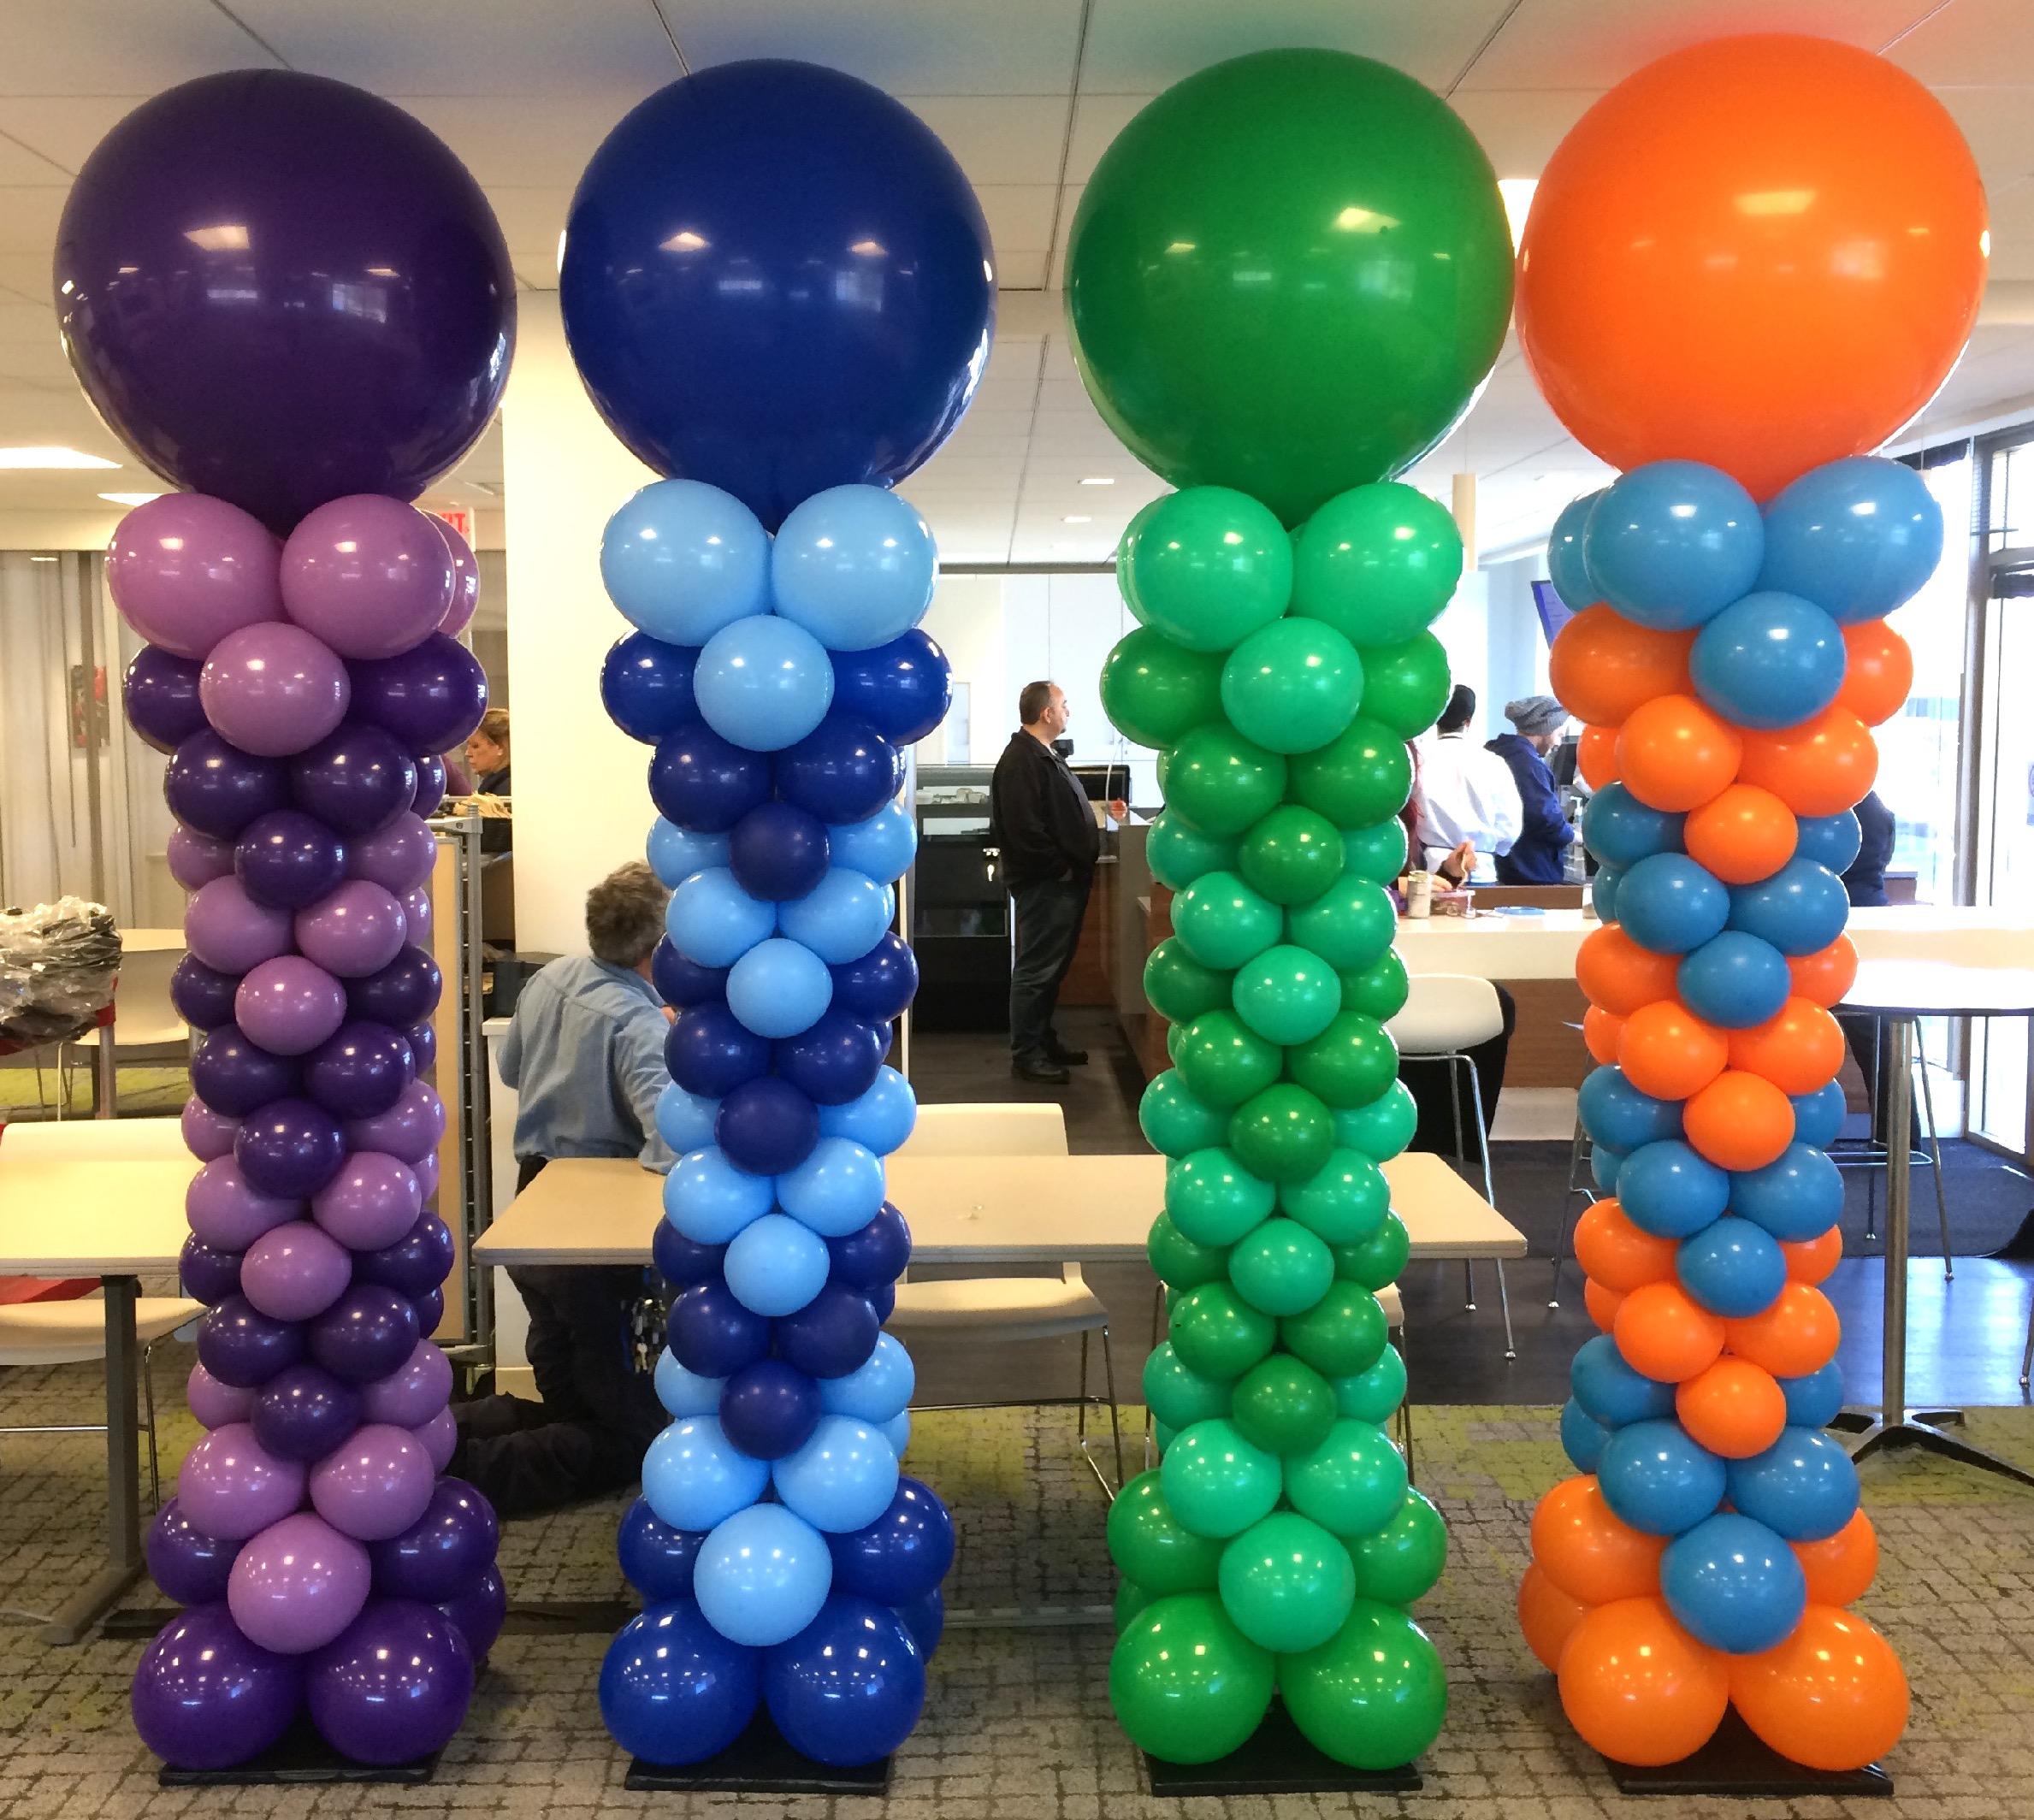 Arrow Pattern Curvy Balloon Columns